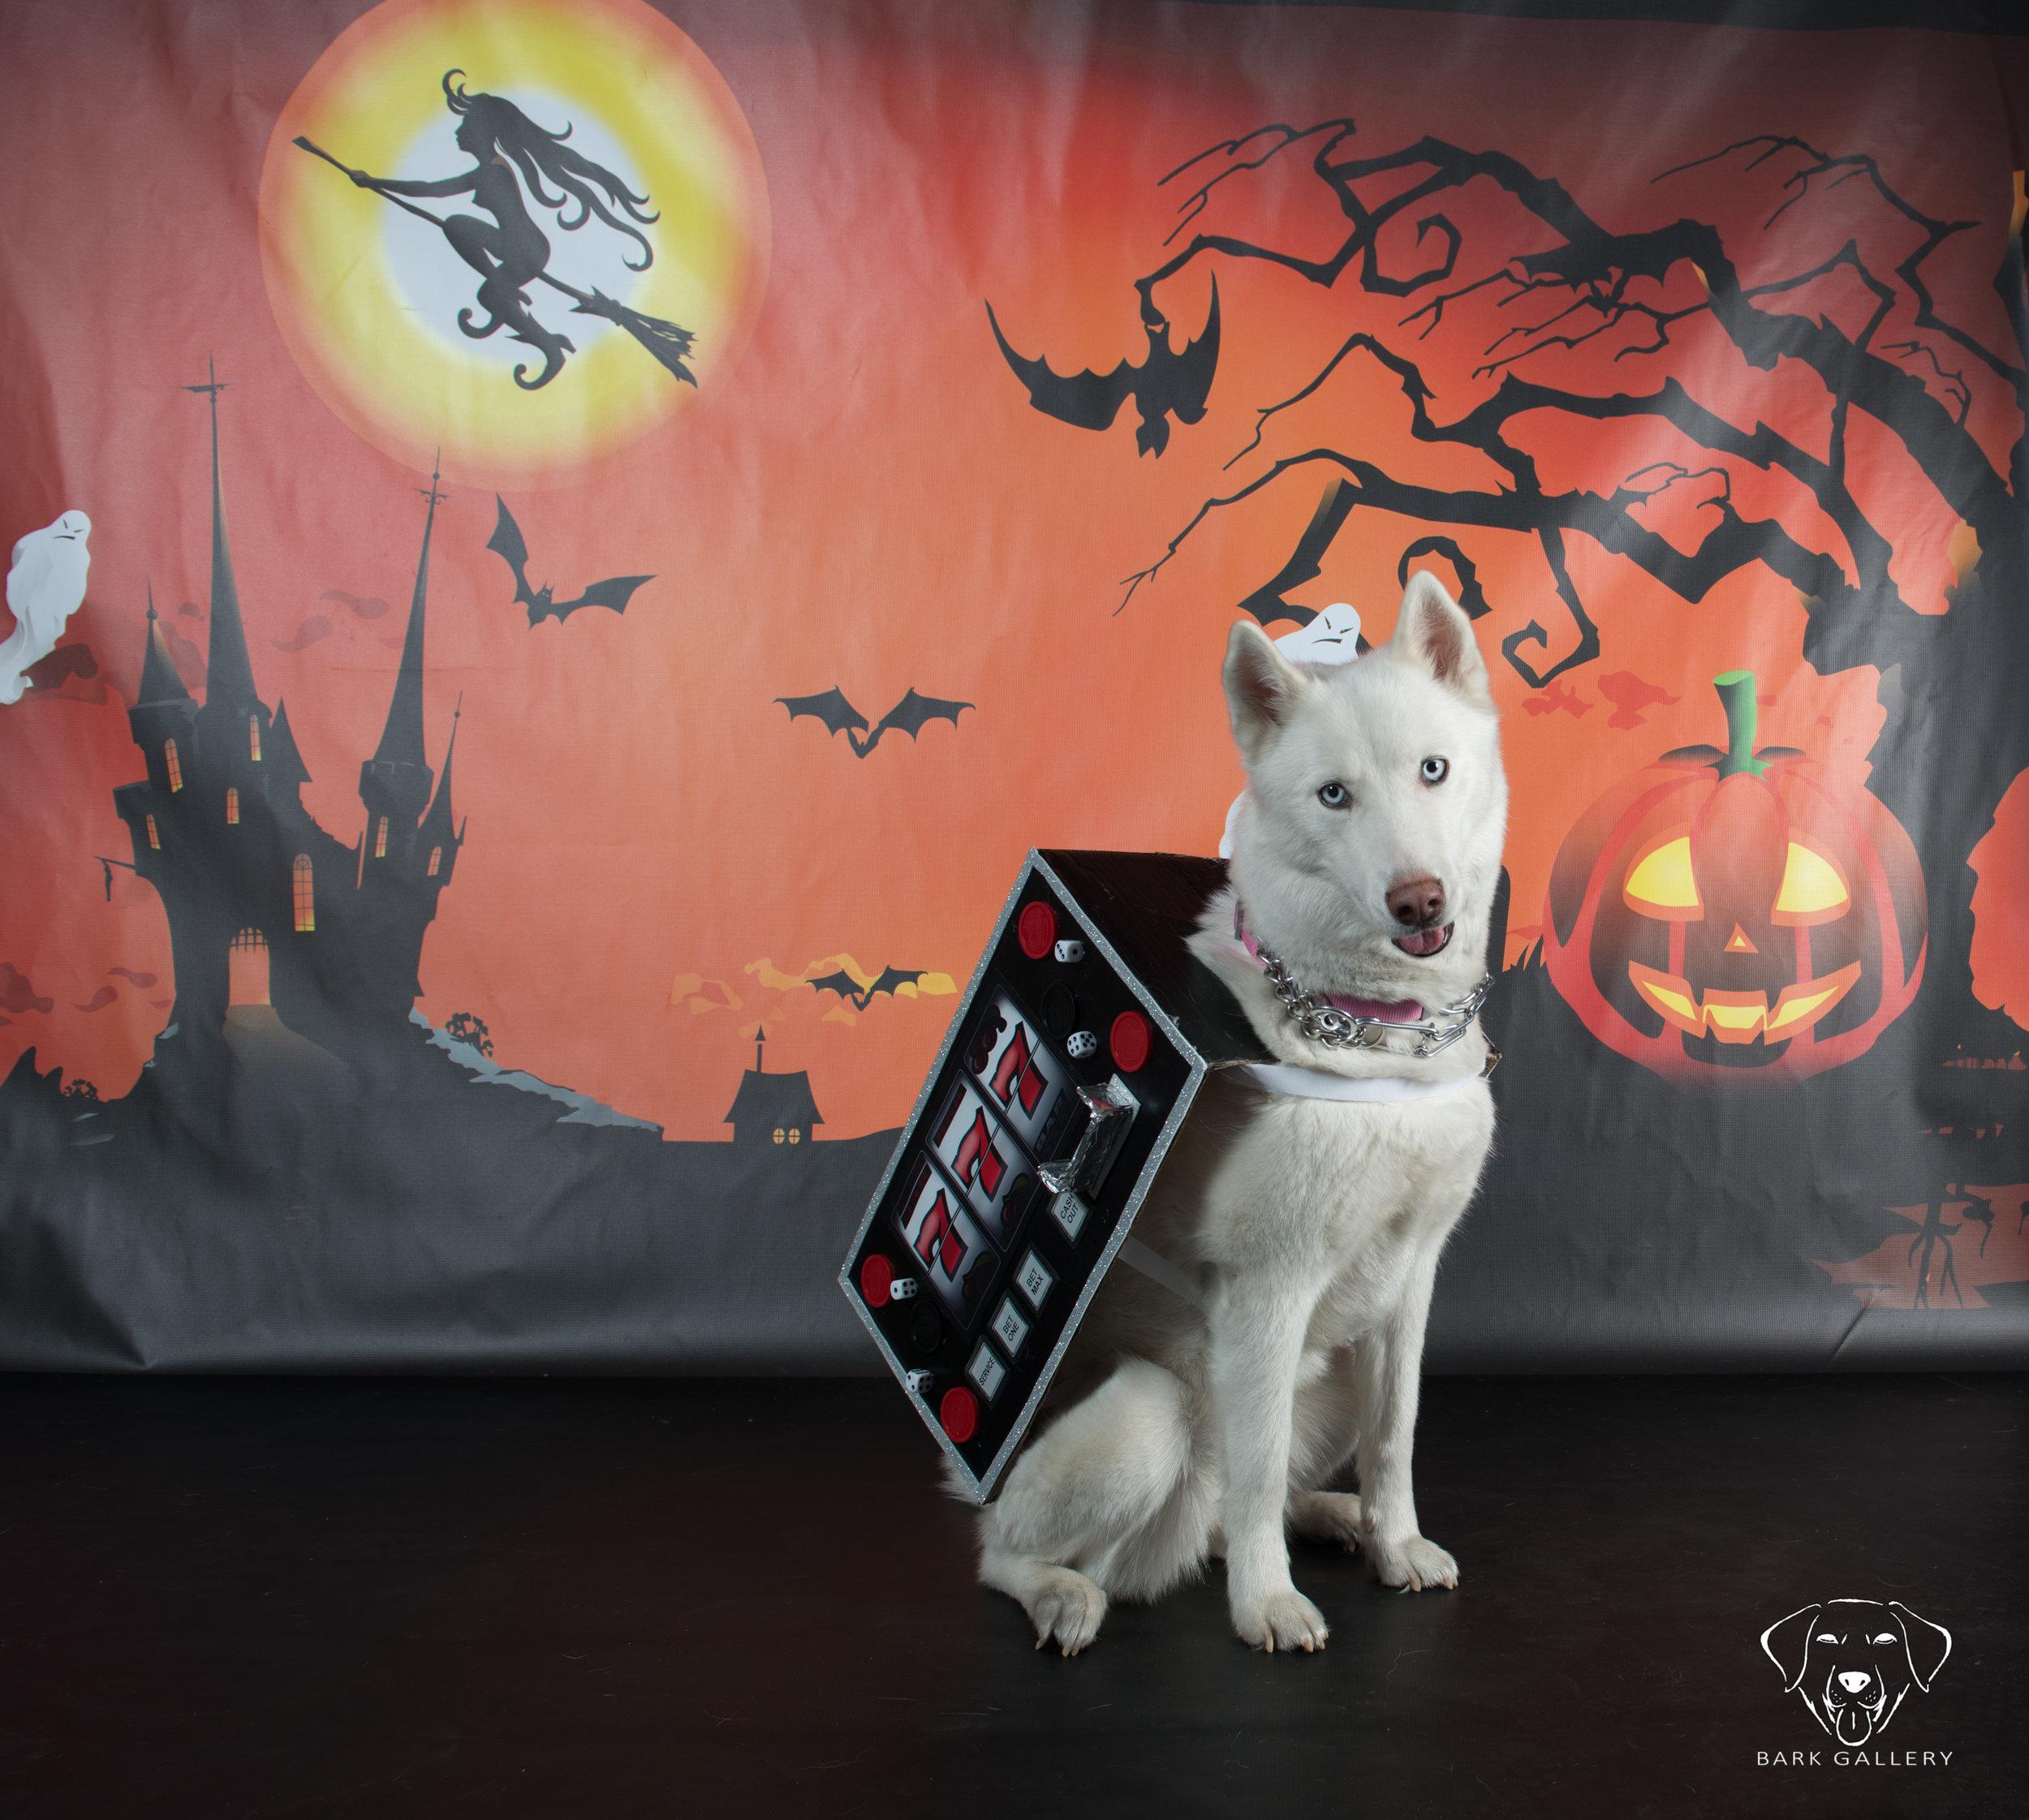 vierkandt-photography-pets-dogs- fundraiser